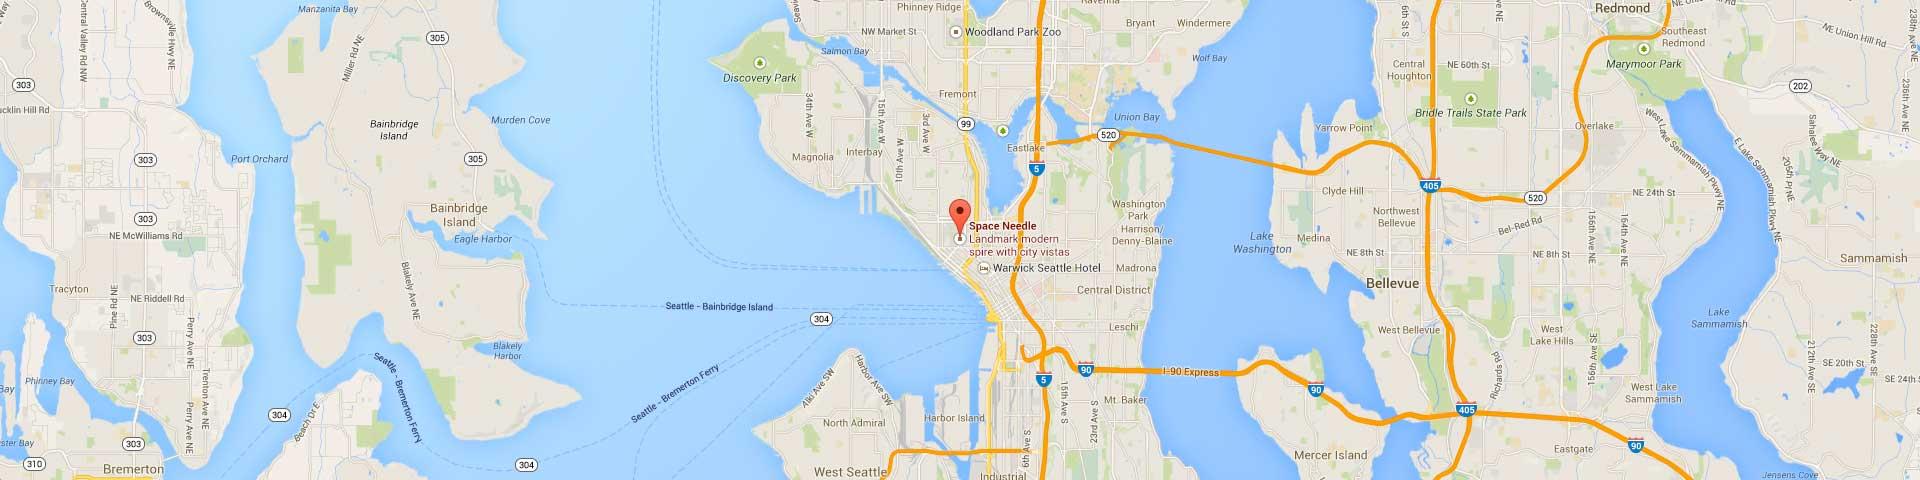 Google Places API and Swift